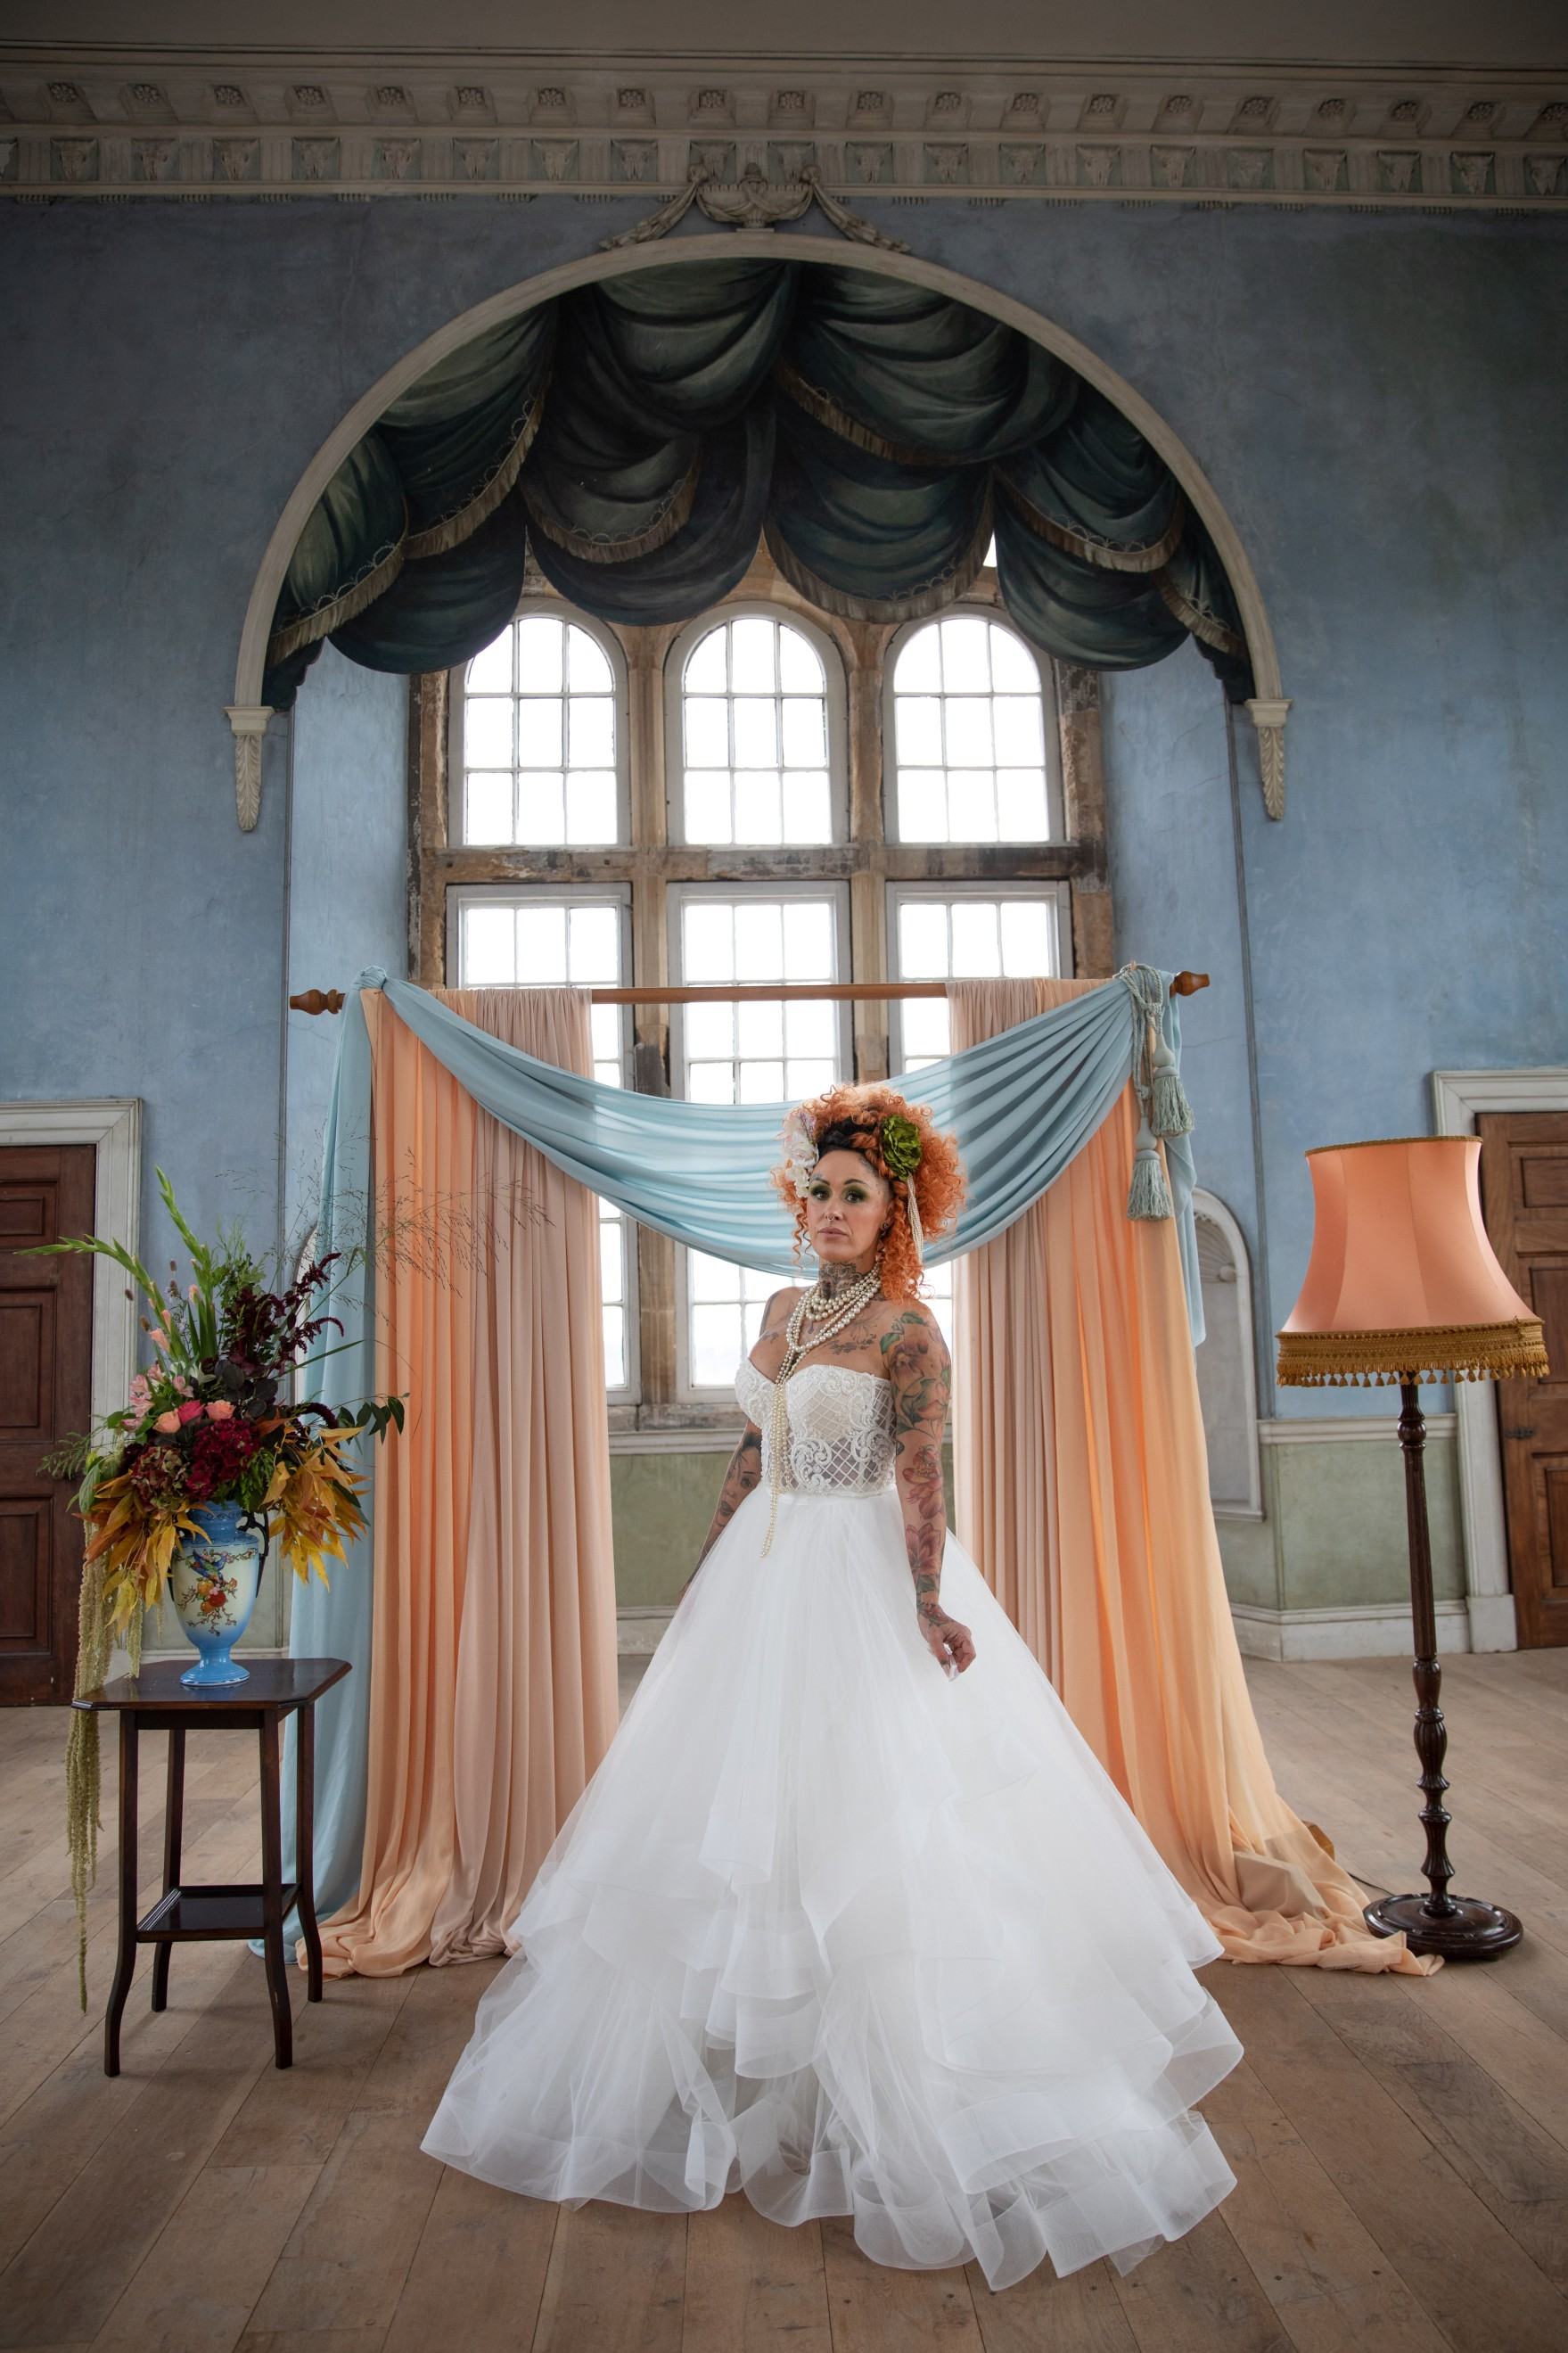 unique pastel wedding - marie antionette wedding - unique bridal look - unique bridal style - themed wedding - historic wedding venue